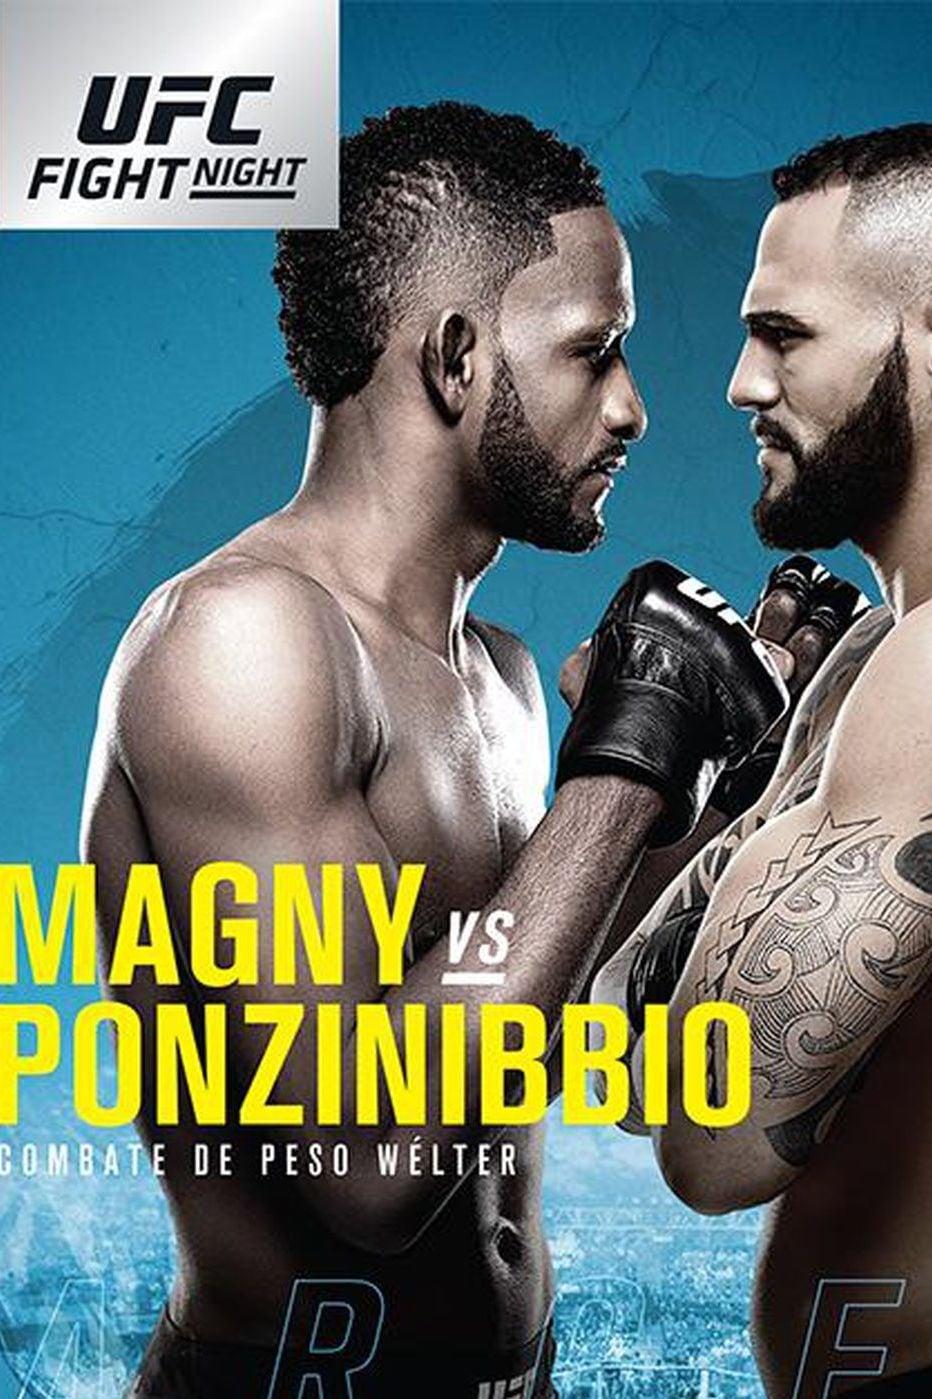 UFC Fight Night 140: Magny vs. Ponzinibbio